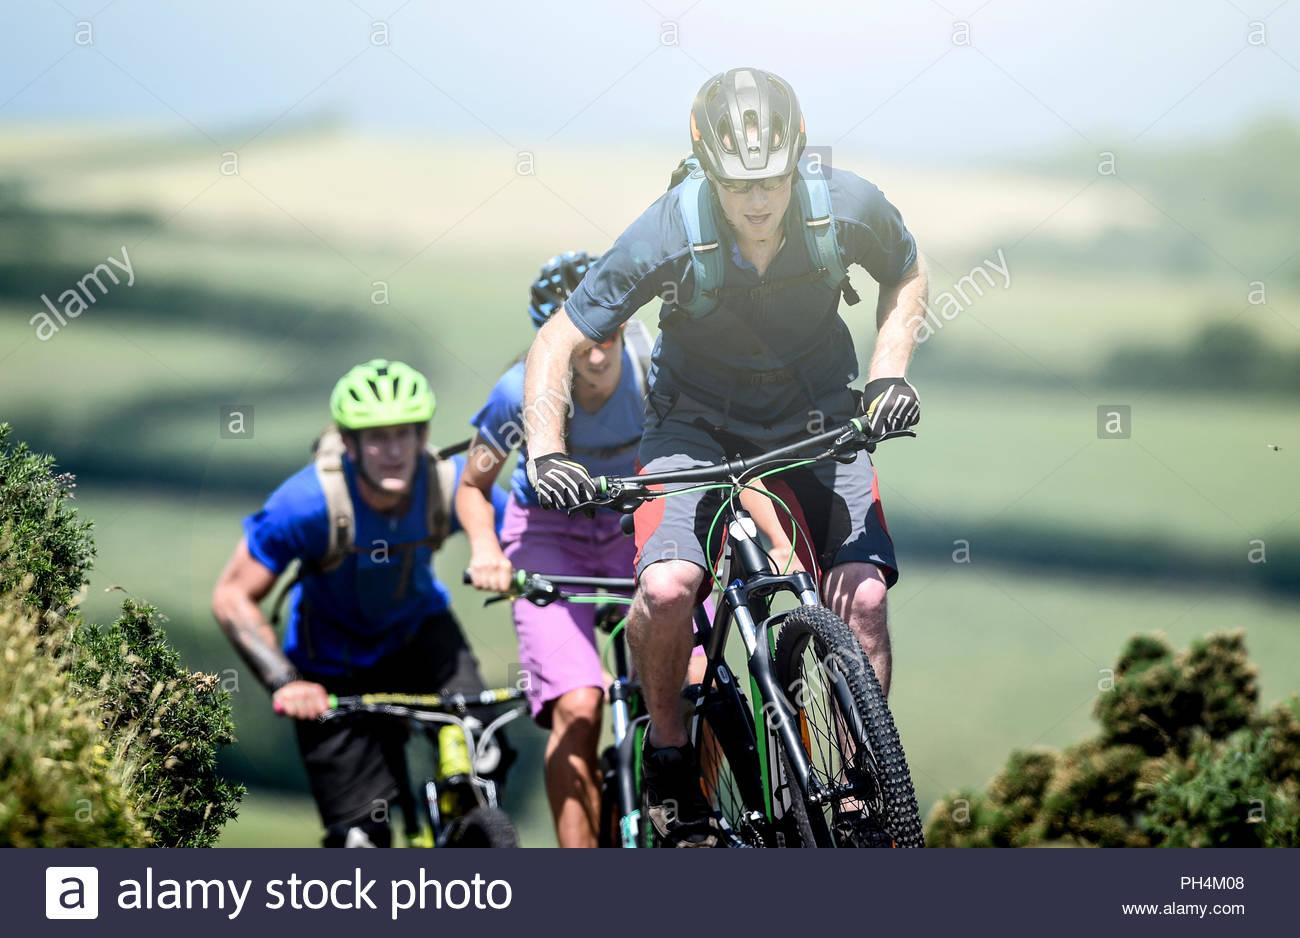 Freunde Mountainbiken in Porlock Wehr, England Stockbild